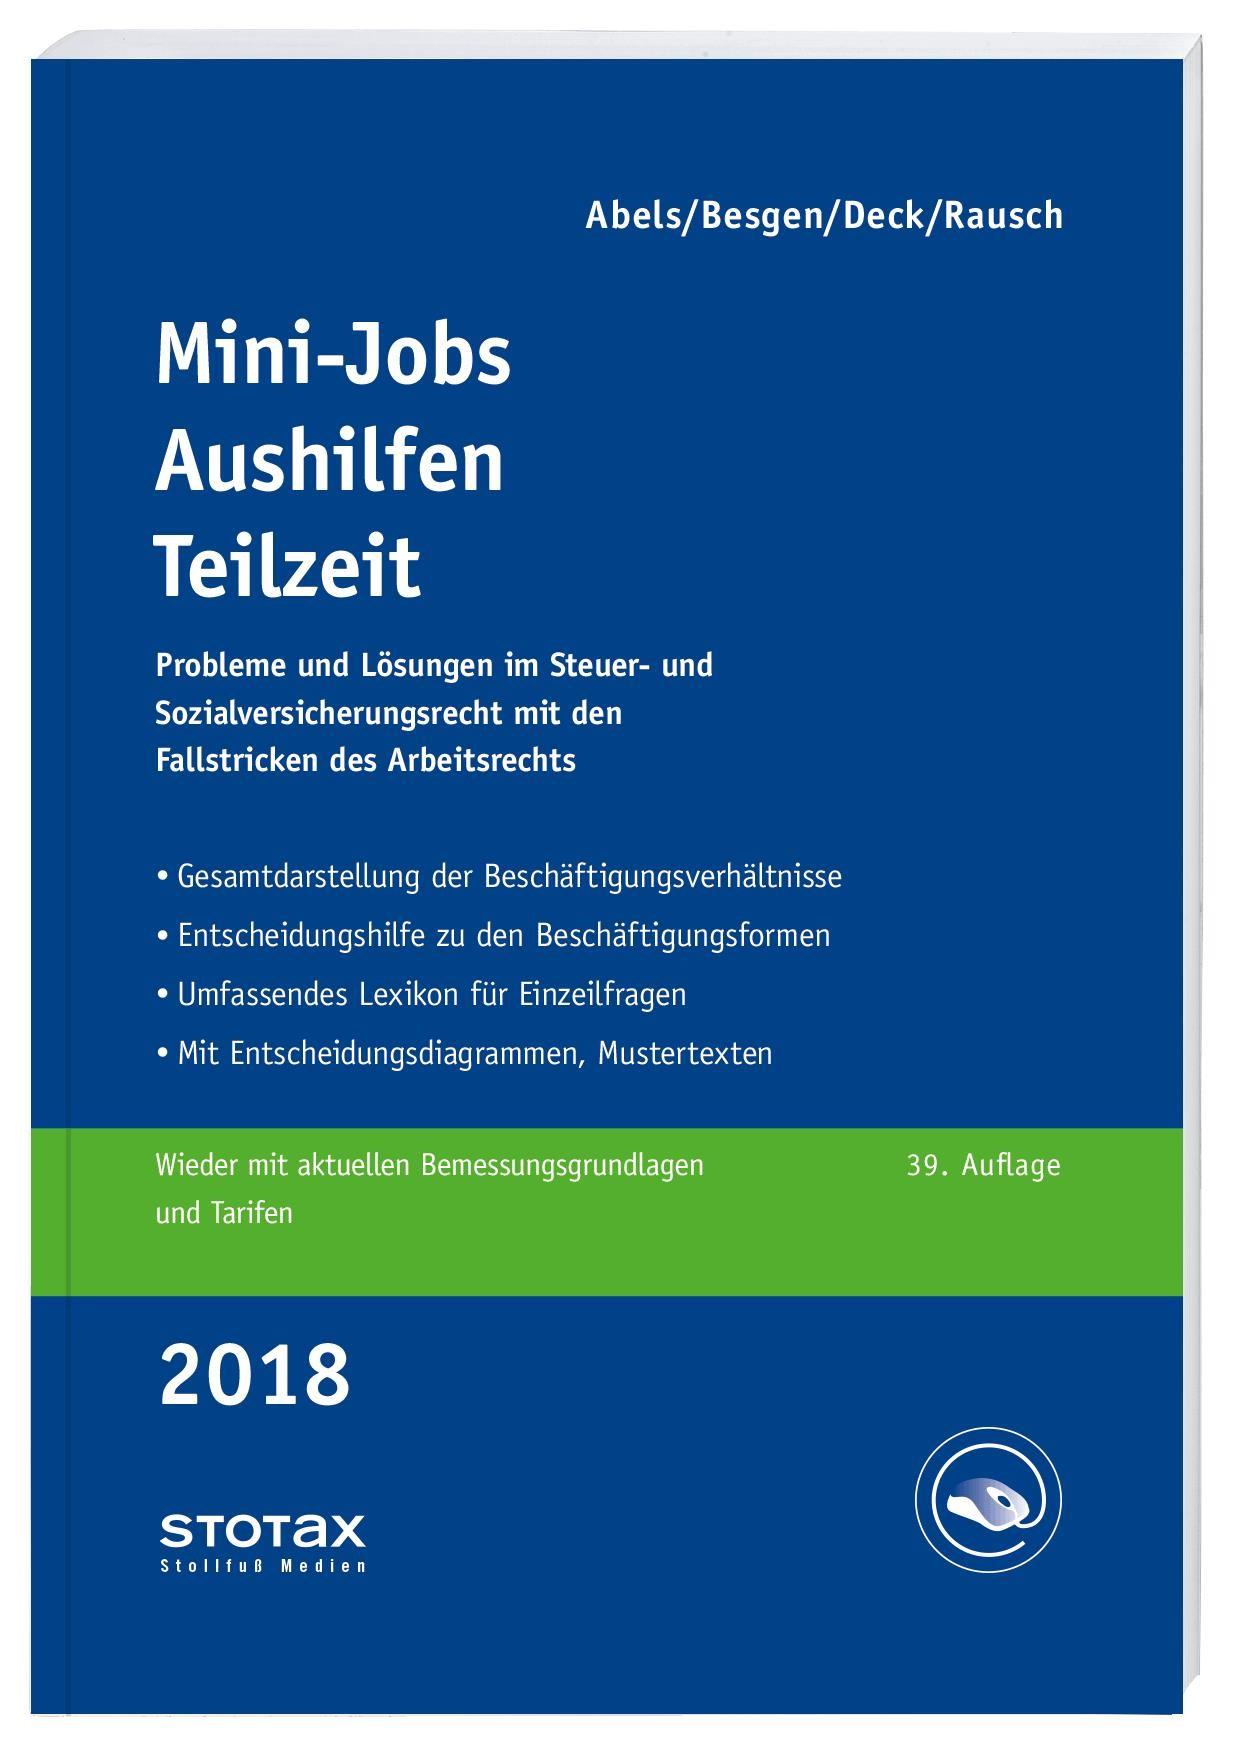 Mini-Jobs, Aushilfen, Teilzeit 2018 • Online | Abels / Besgen / Deck / Rausch, 2016 (Cover)